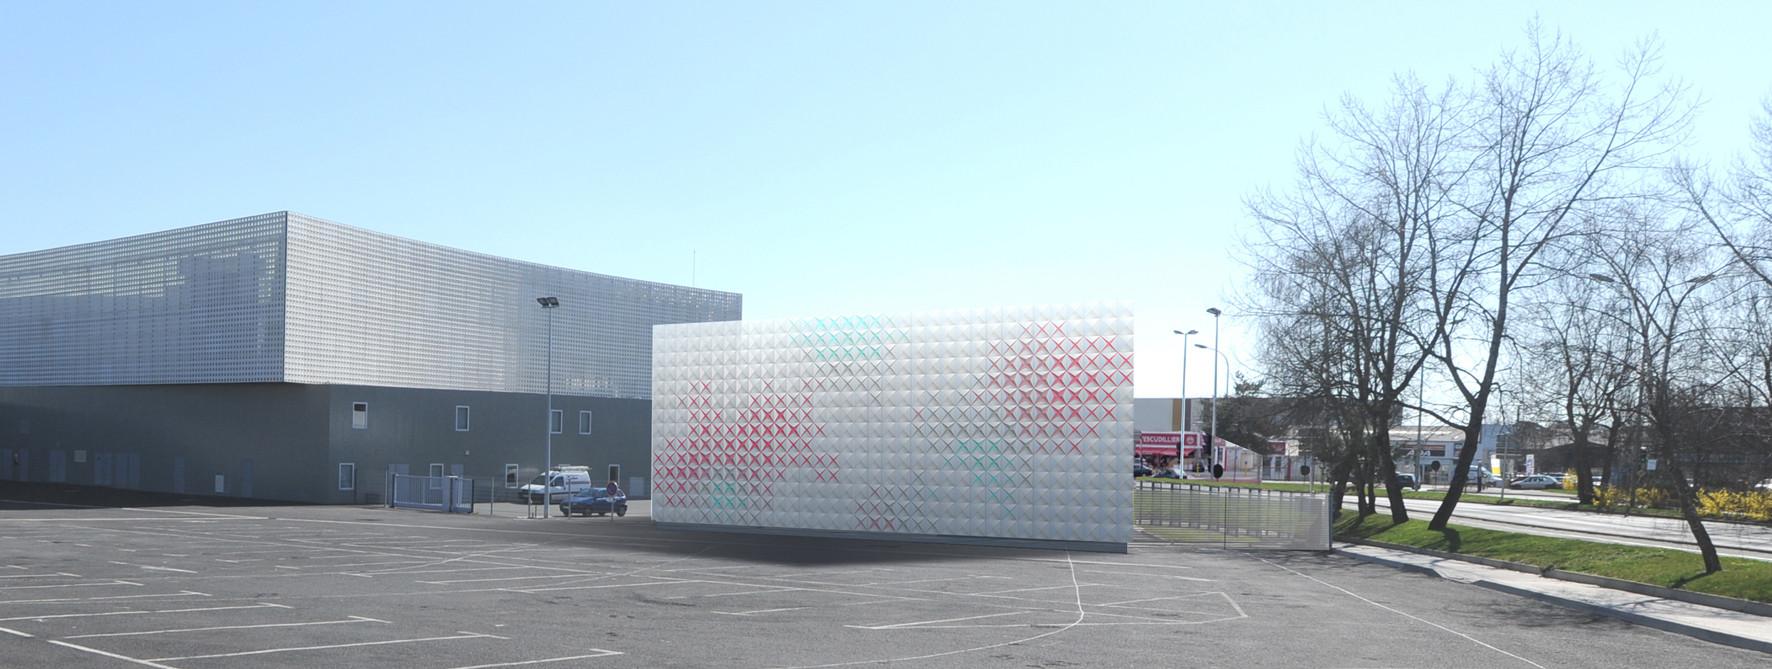 Techno-Prisme Storage Depot / Brisac Gonzalez, Courtesy of Brisac Gonzalez